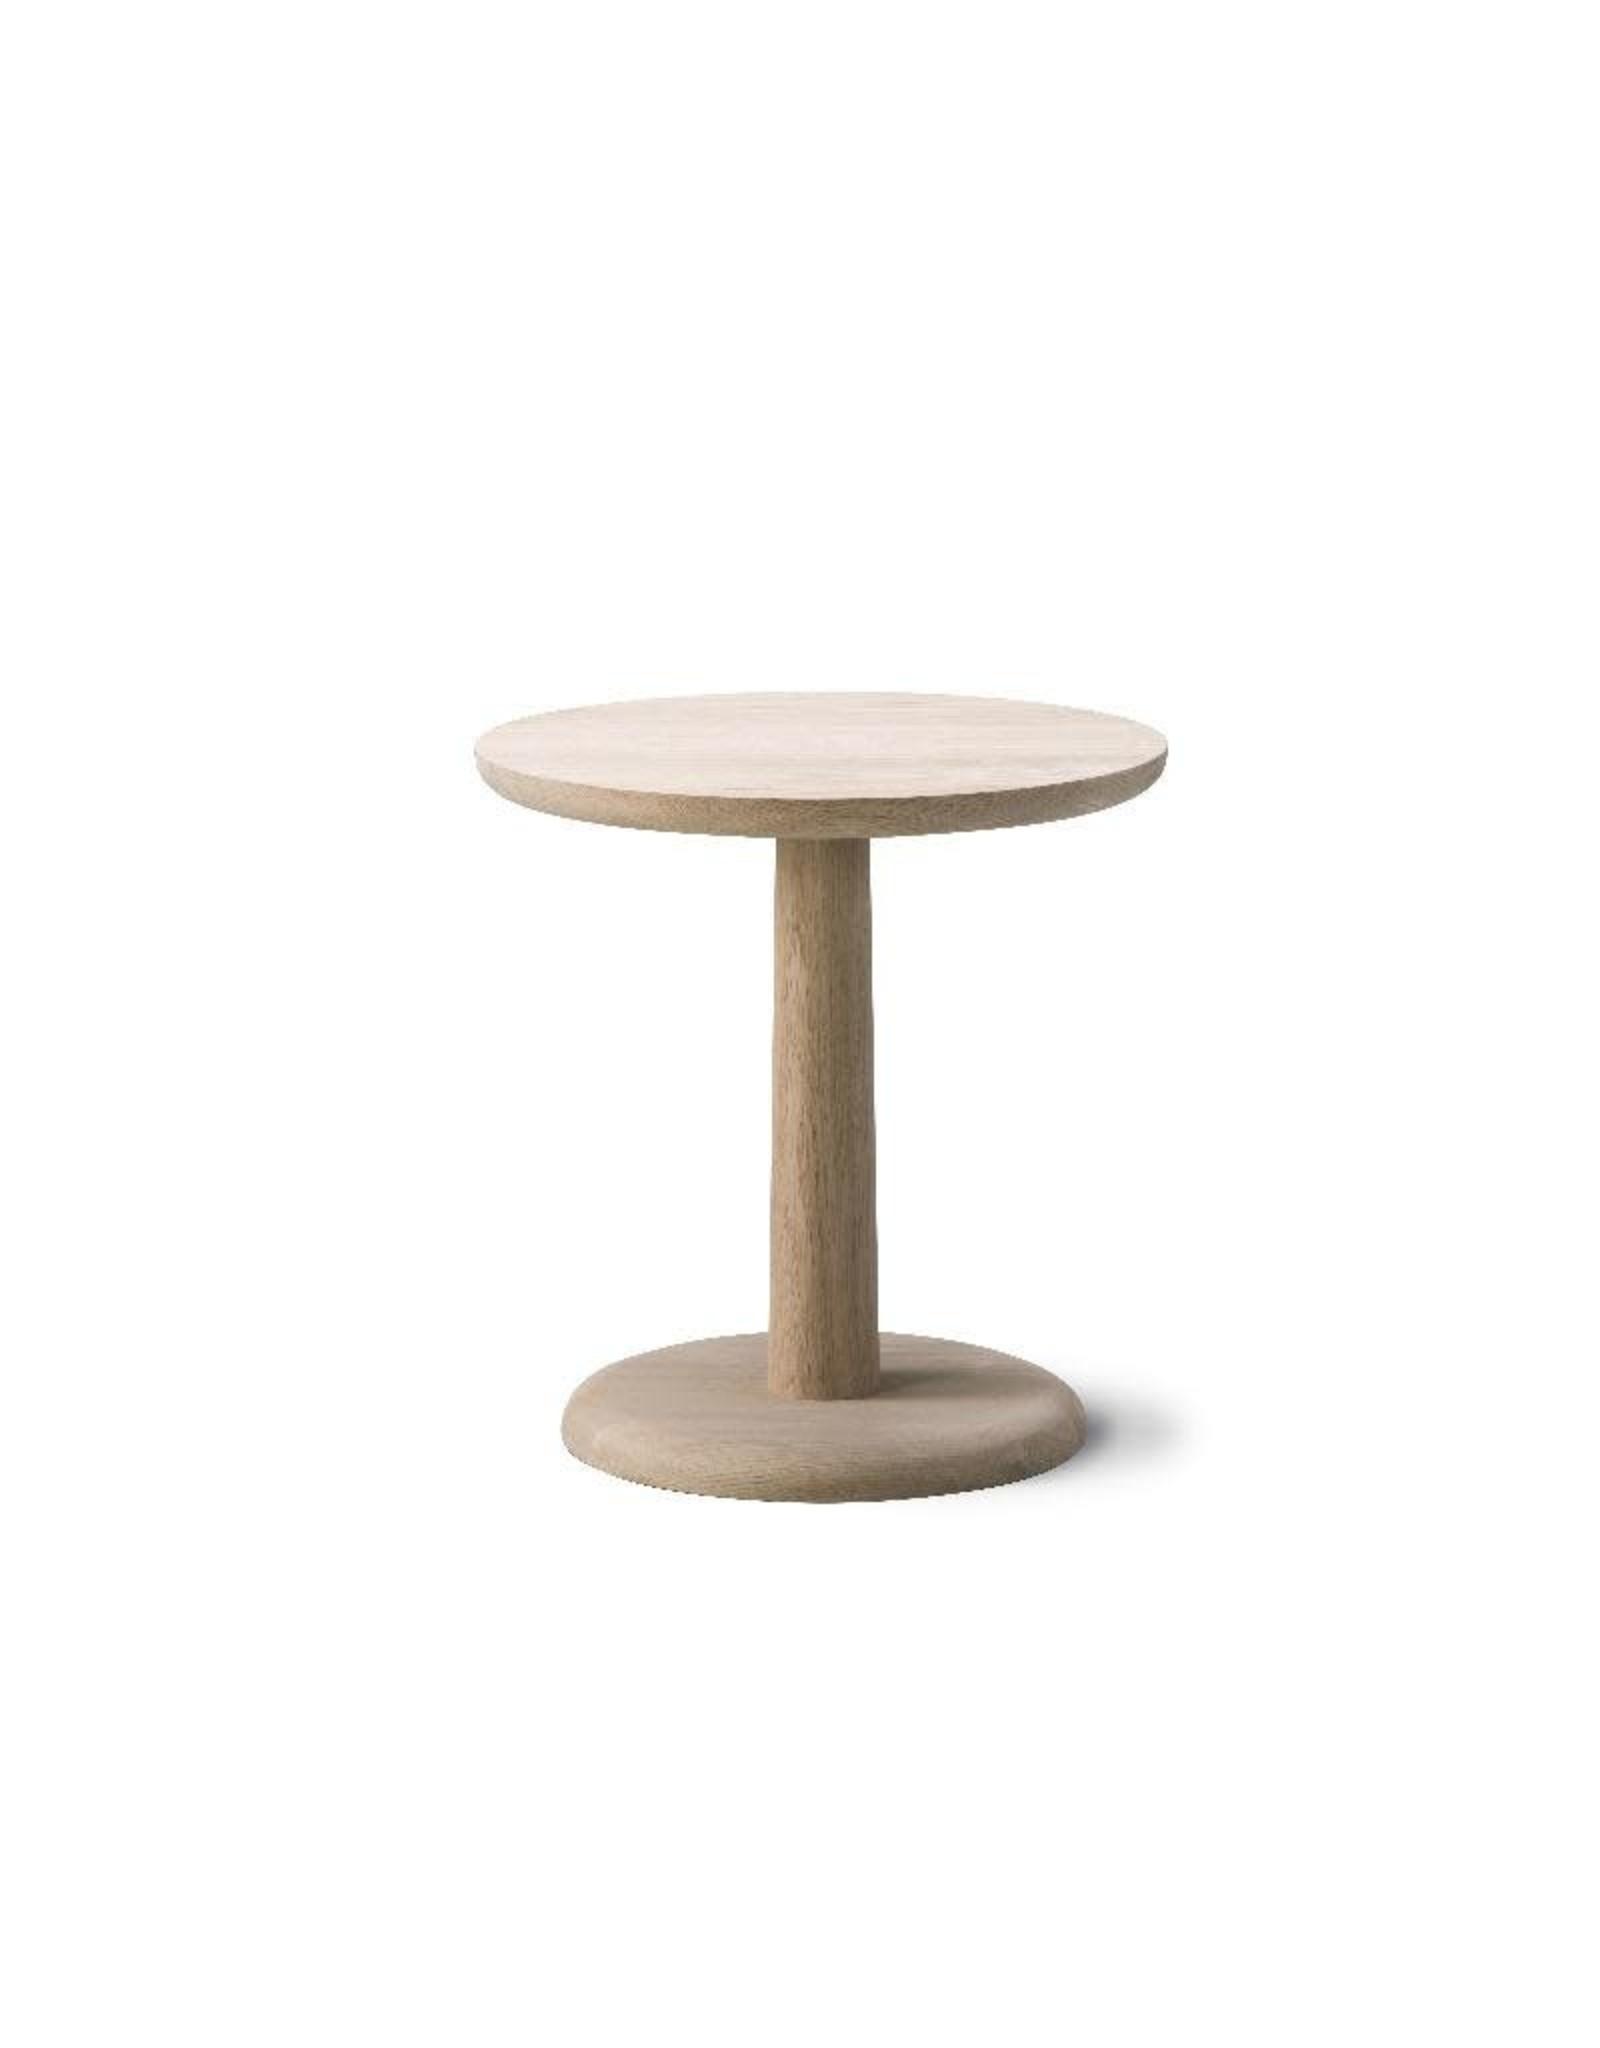 FREDERICIA PON ROUND COFFEE TABLE